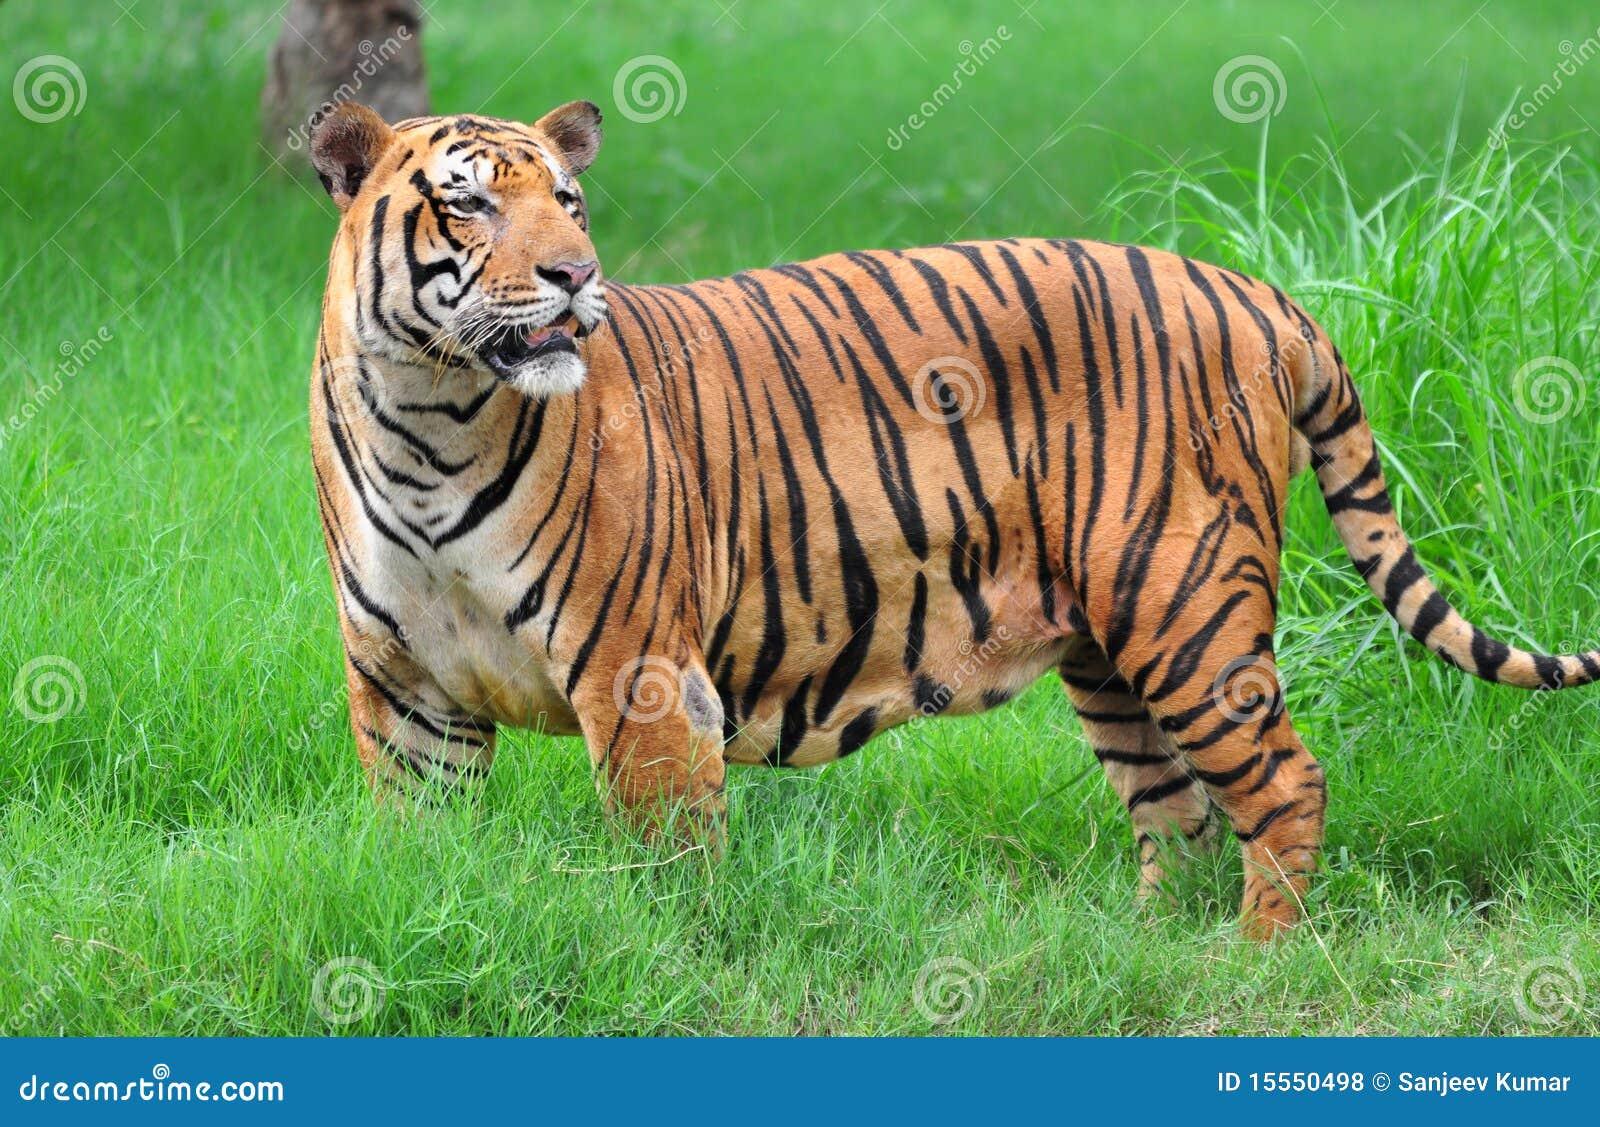 Bengal Tiger Stock Photo Image Of Tail Bushes Animal